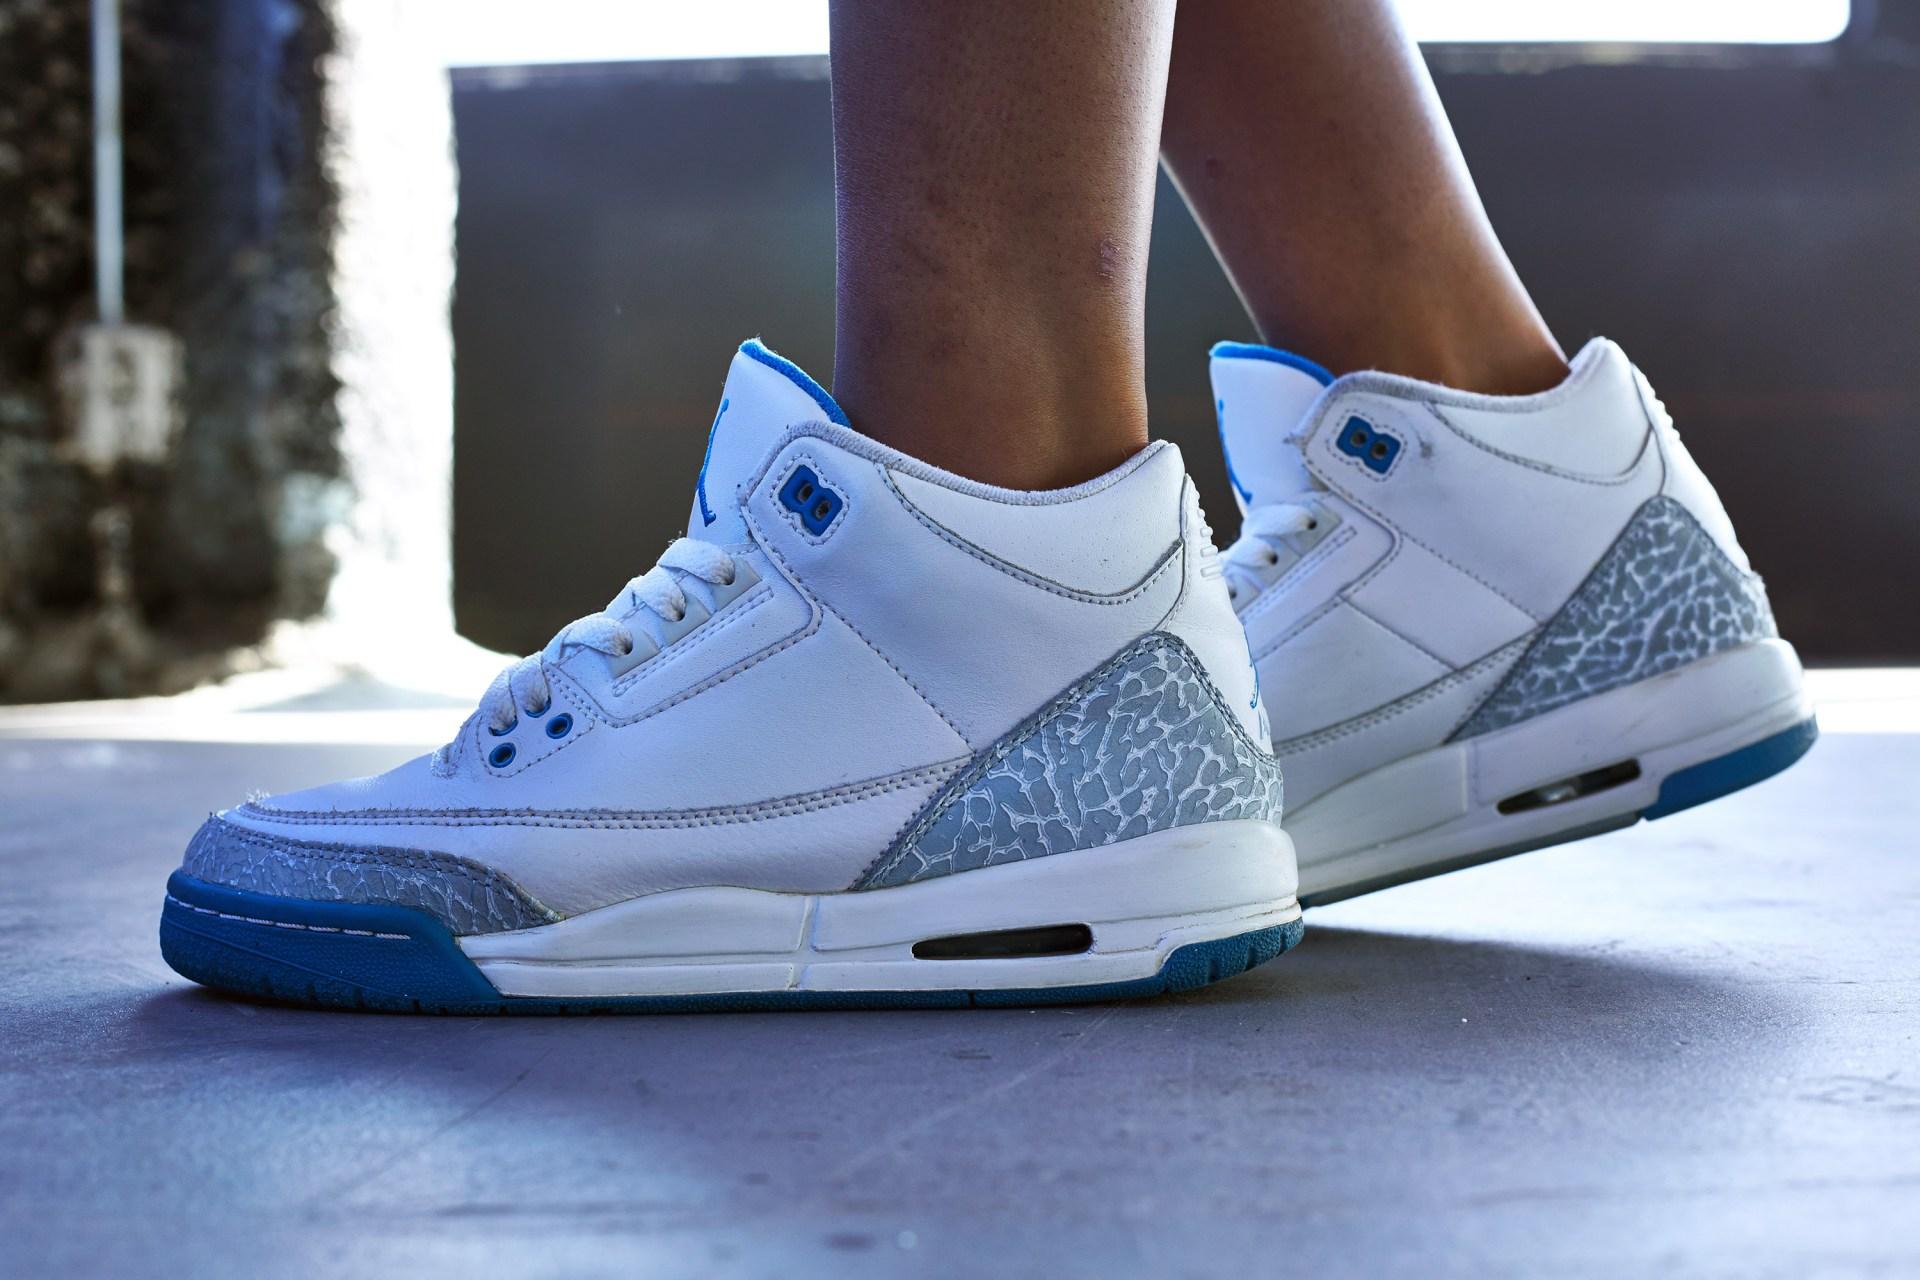 new arrival dbaaf 6d79e On-Foot Look #TBT Edition // Air Jordan 3